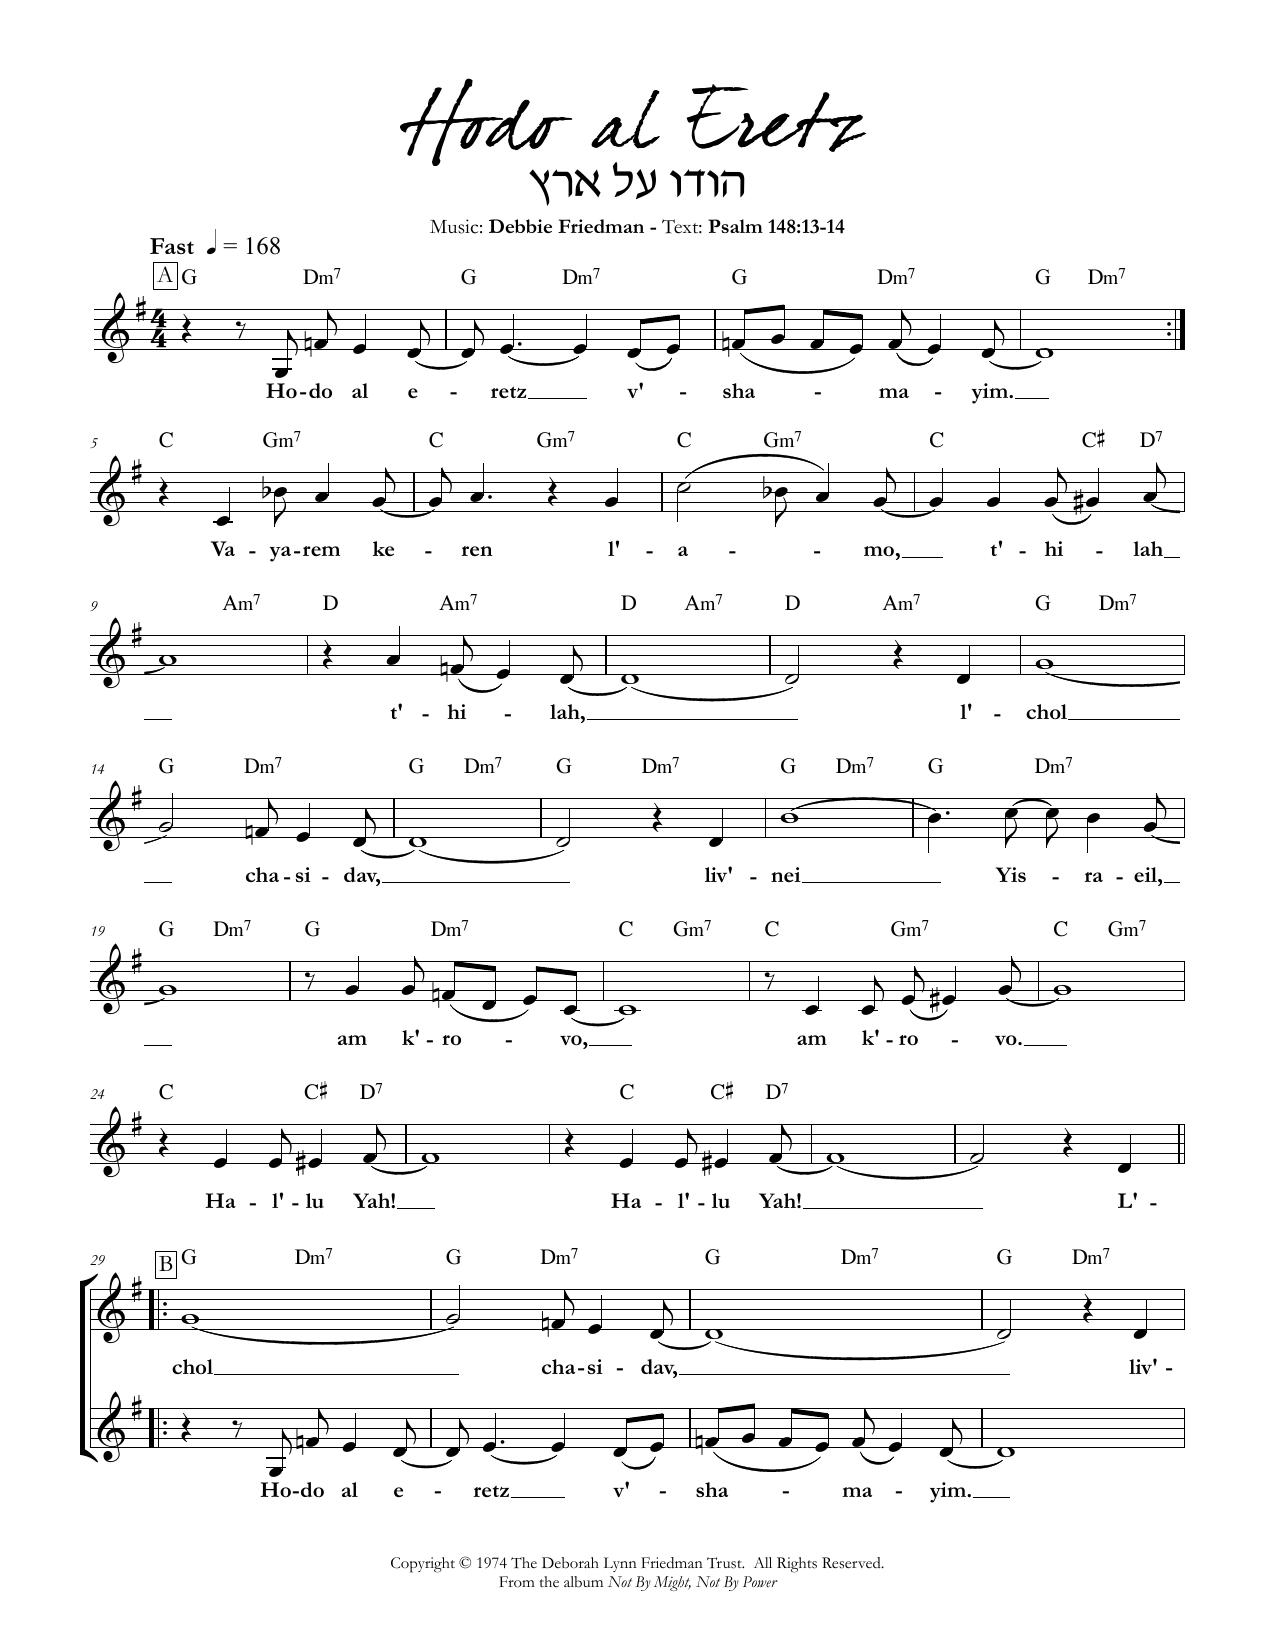 Hodo Al Eretz Sheet Music